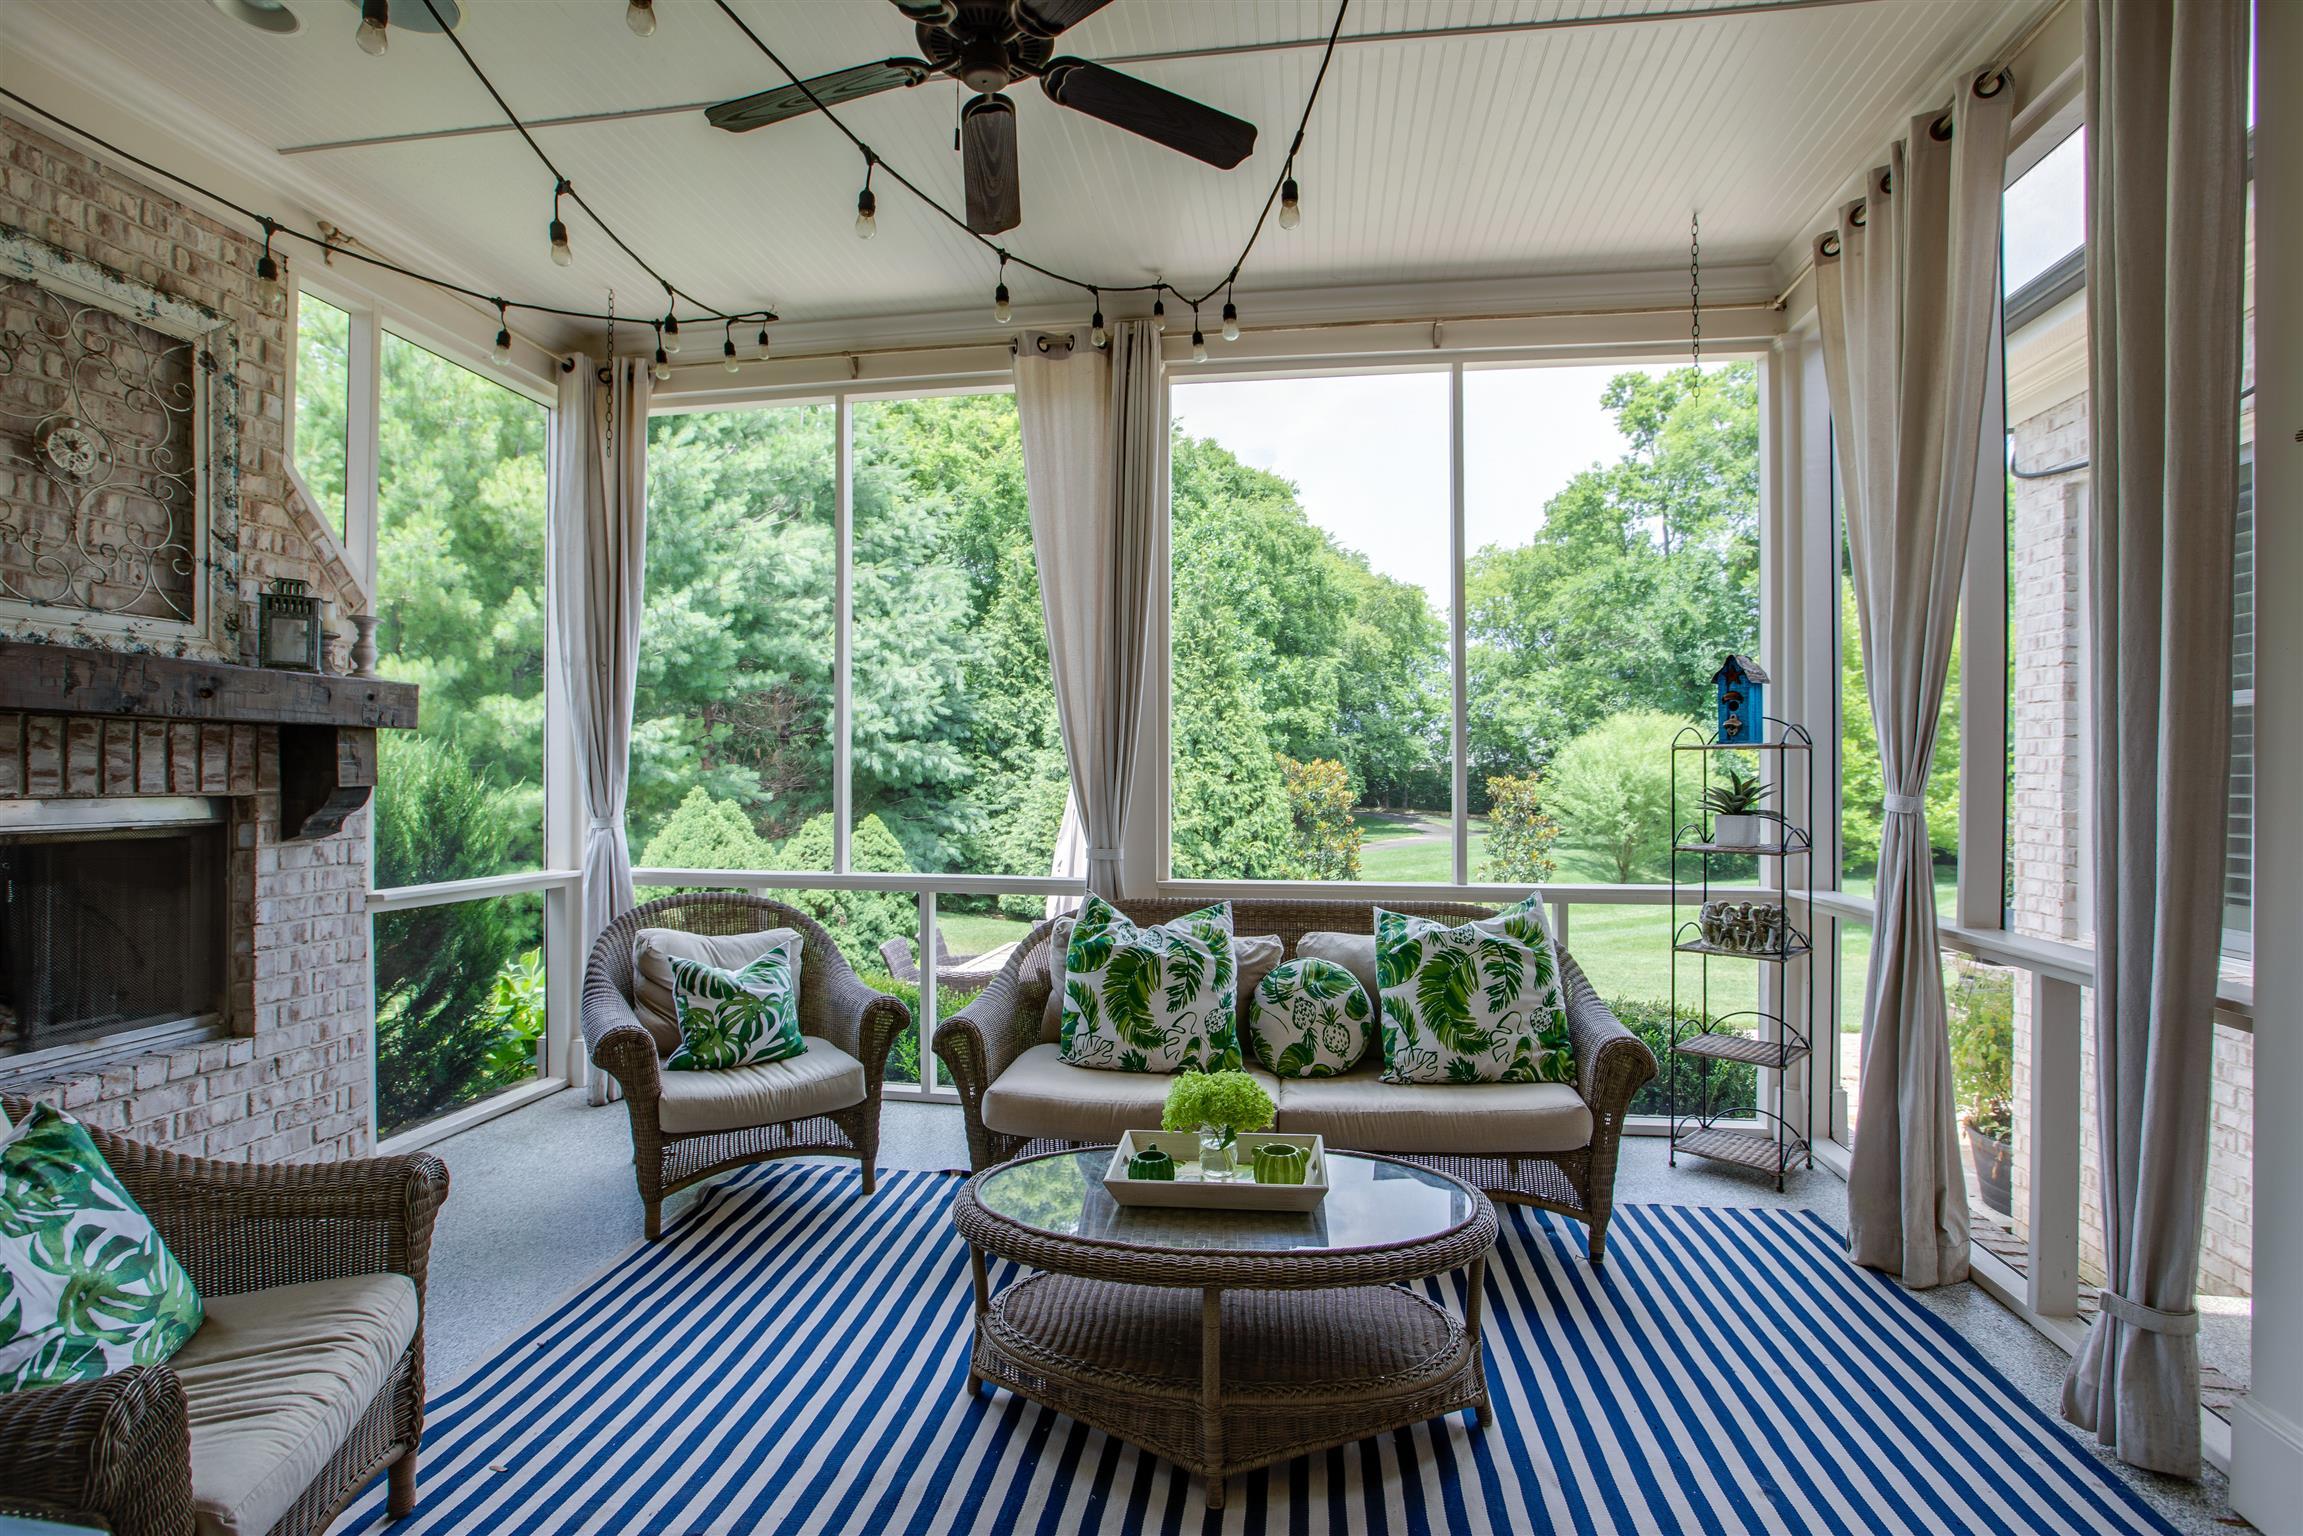 450 Acadia Ave, Franklin, TN 37064 - Franklin, TN real estate listing